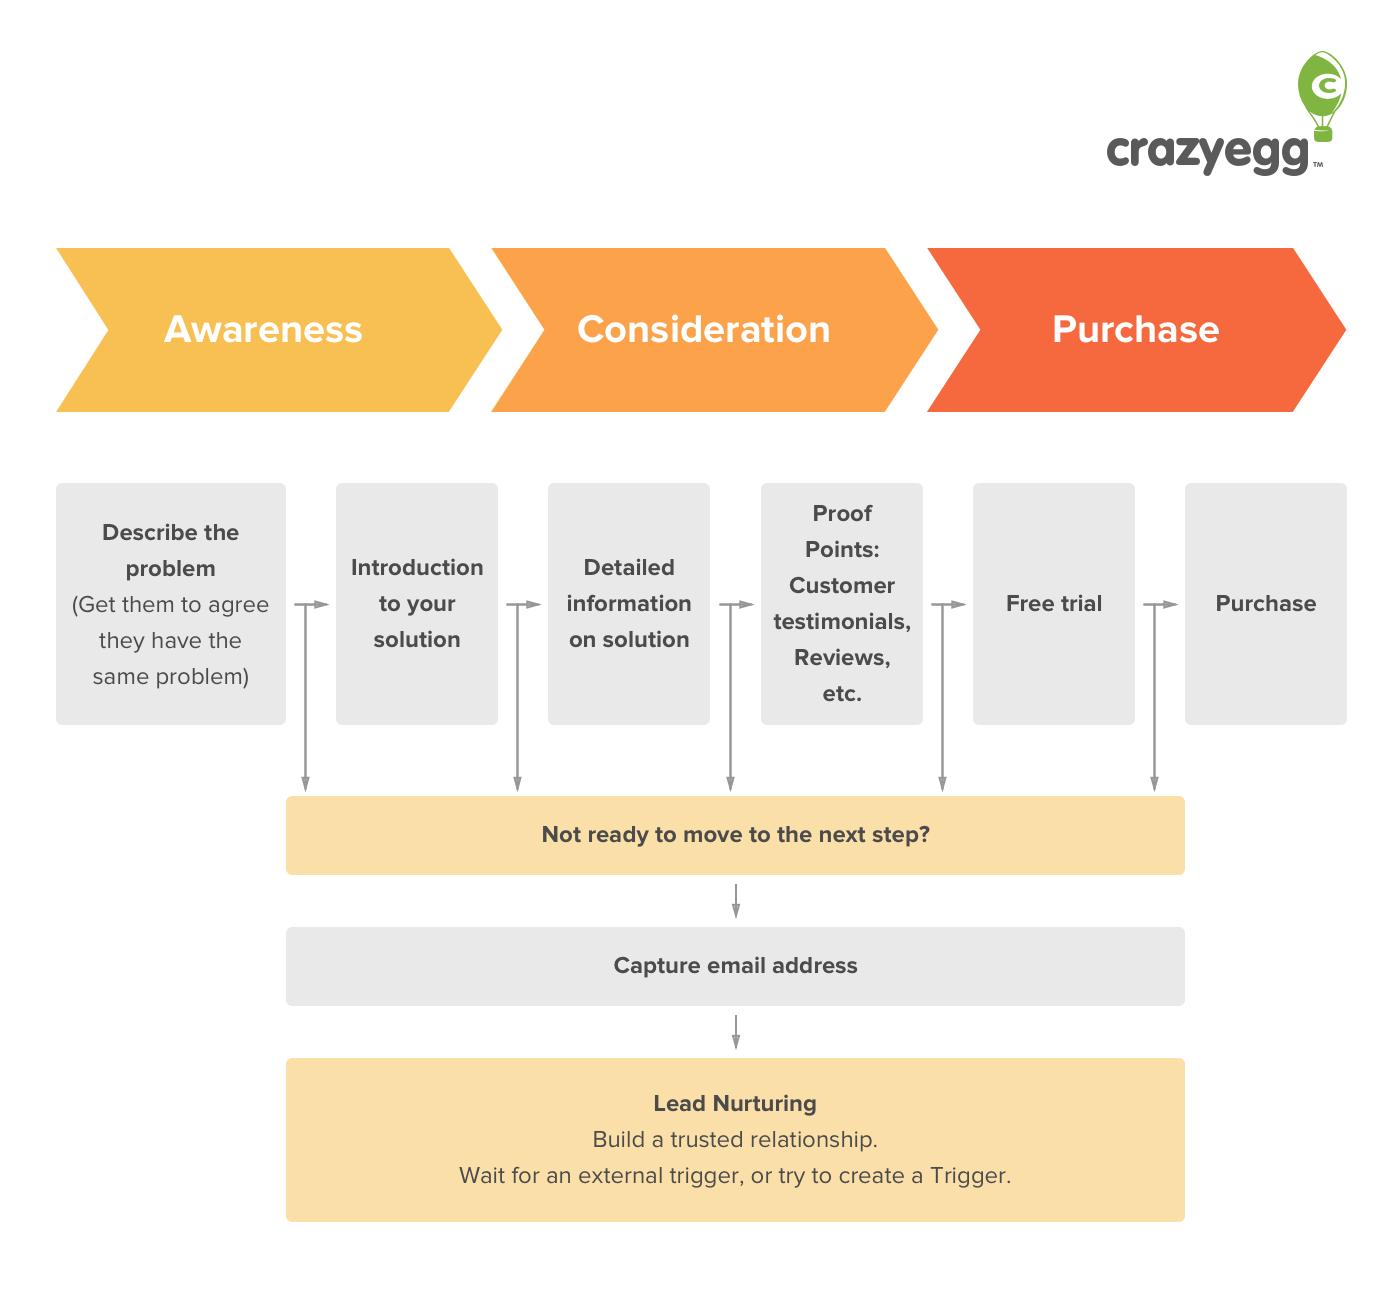 Buyers journey steps